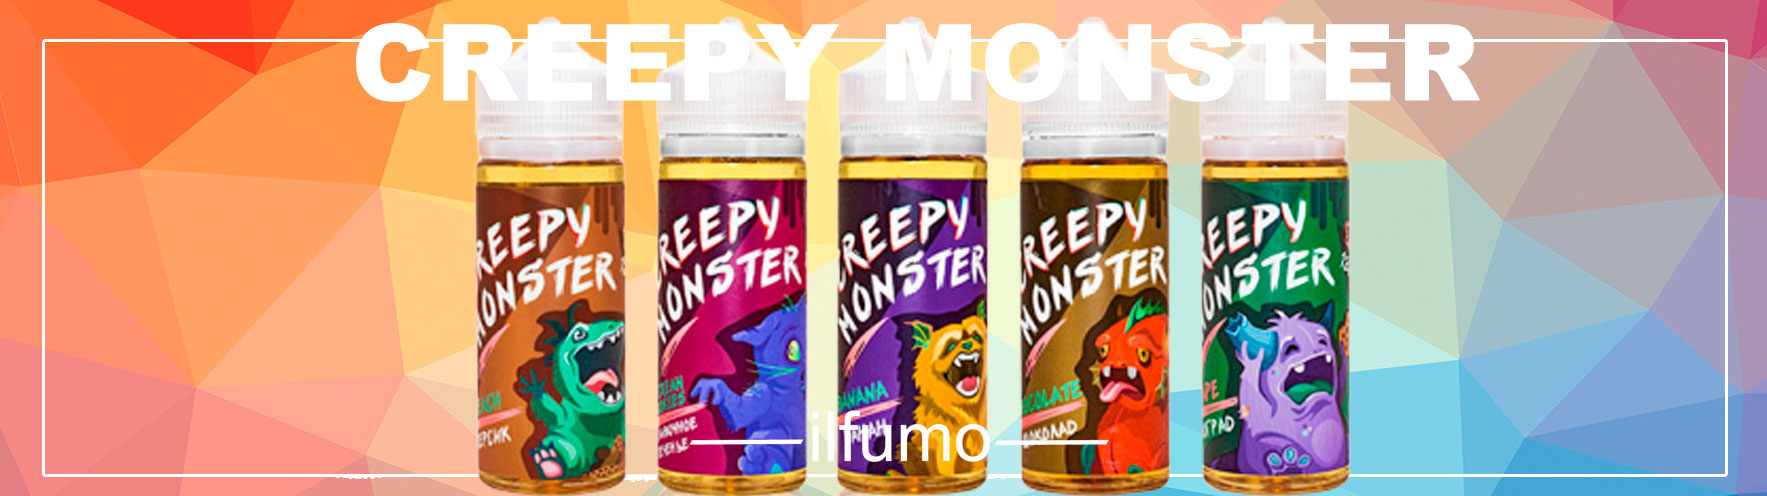 Creepy Monster